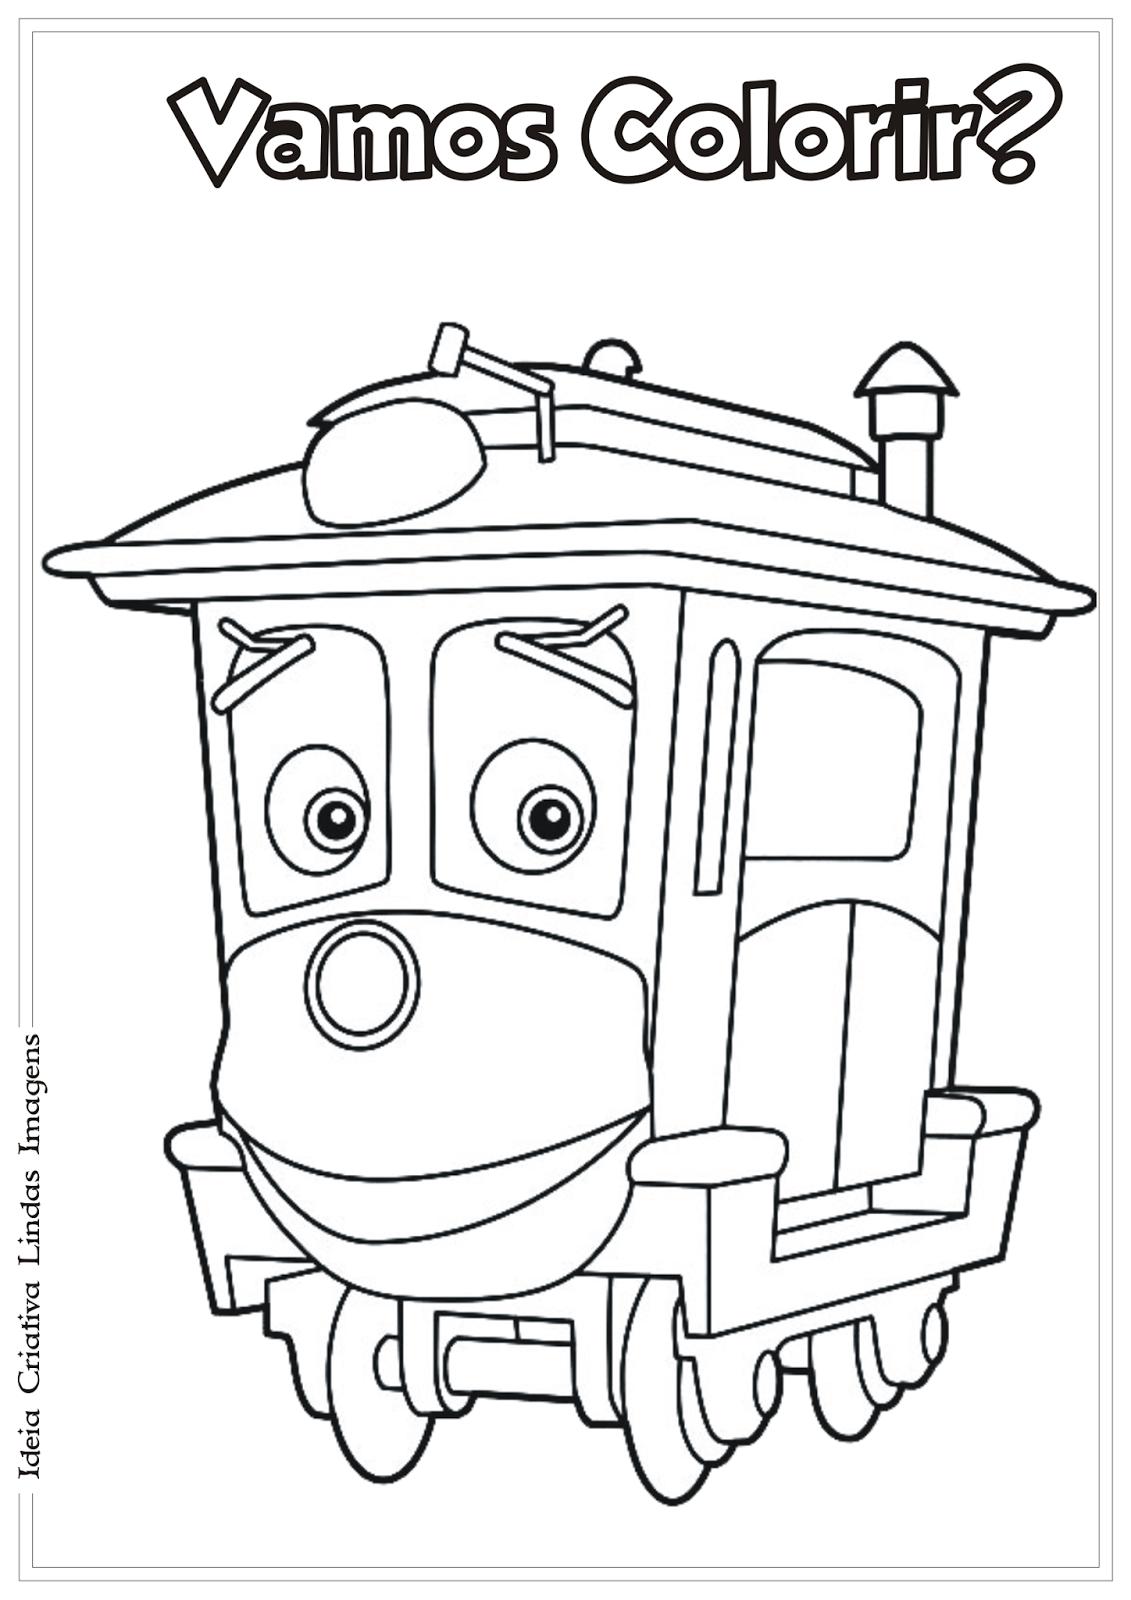 Chuggington desenho para colorir